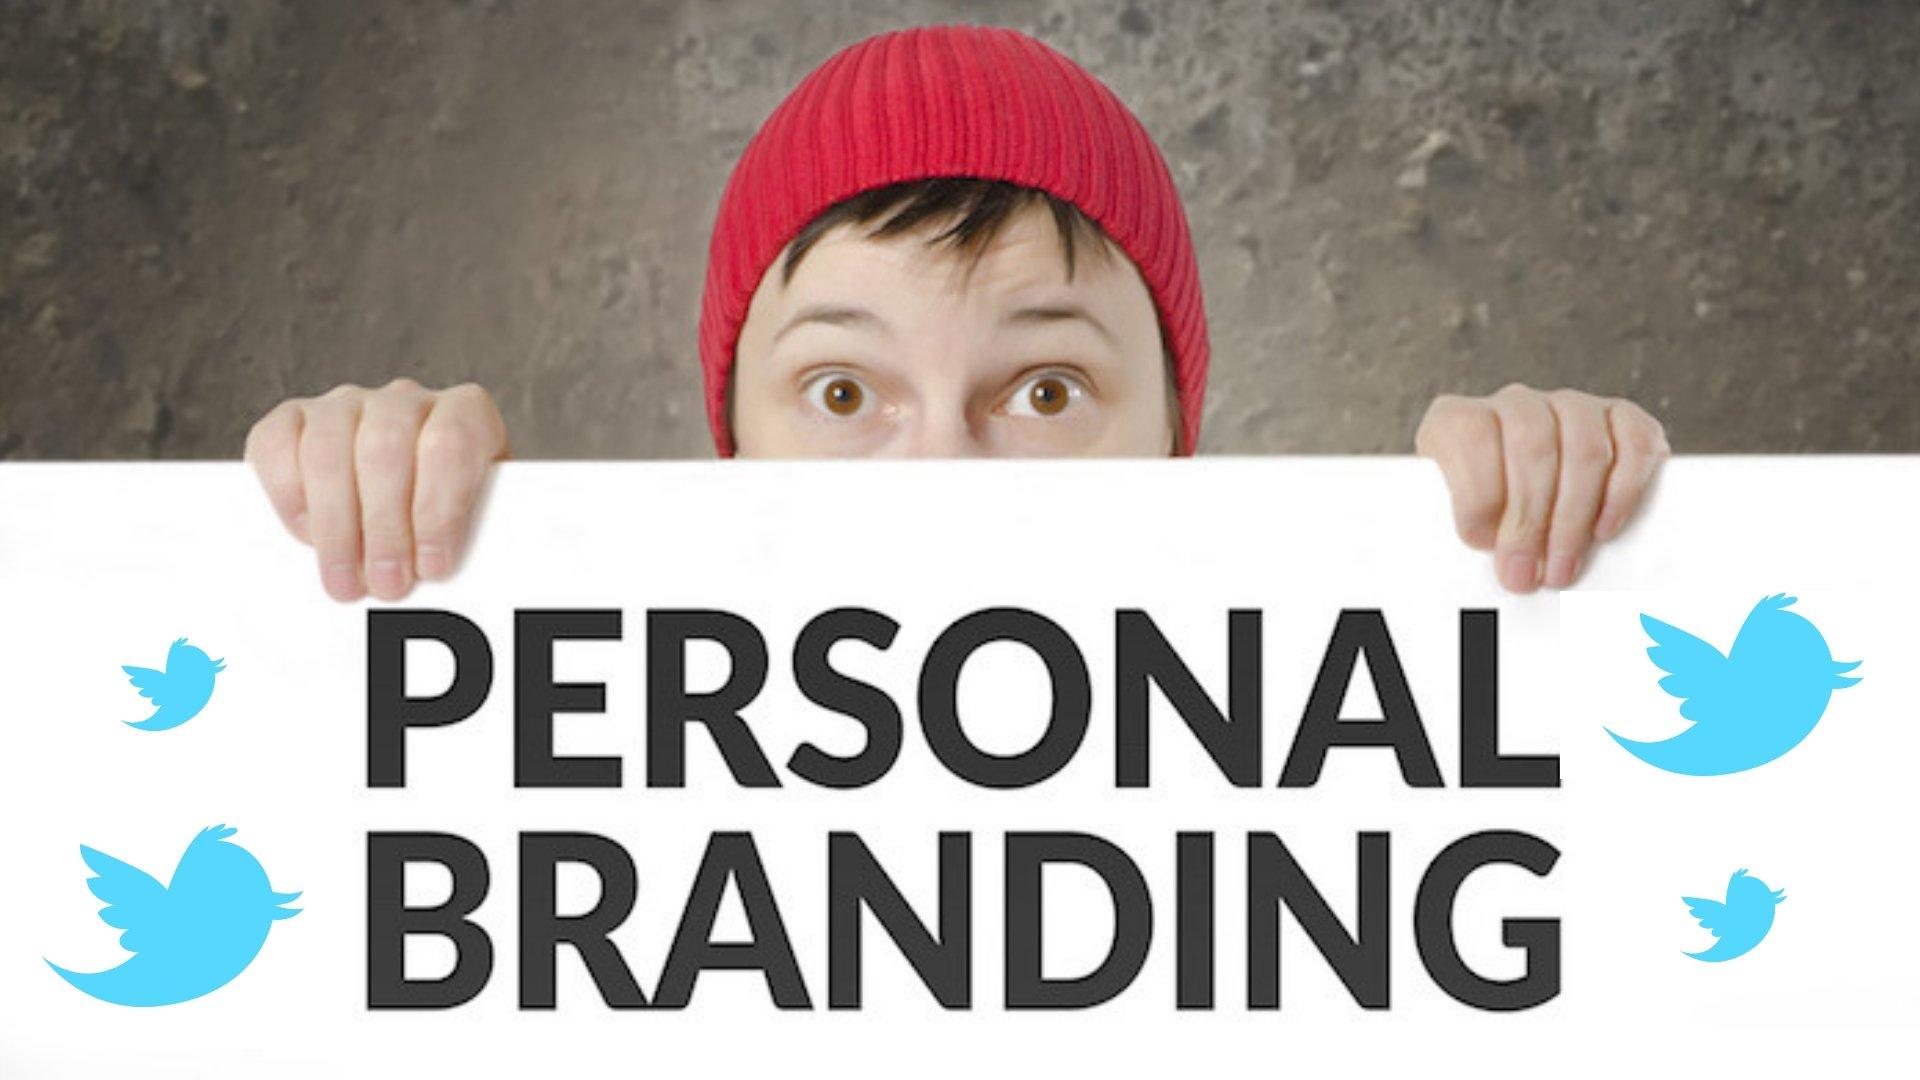 Personal branding su Twitter: strategia sempre efficace